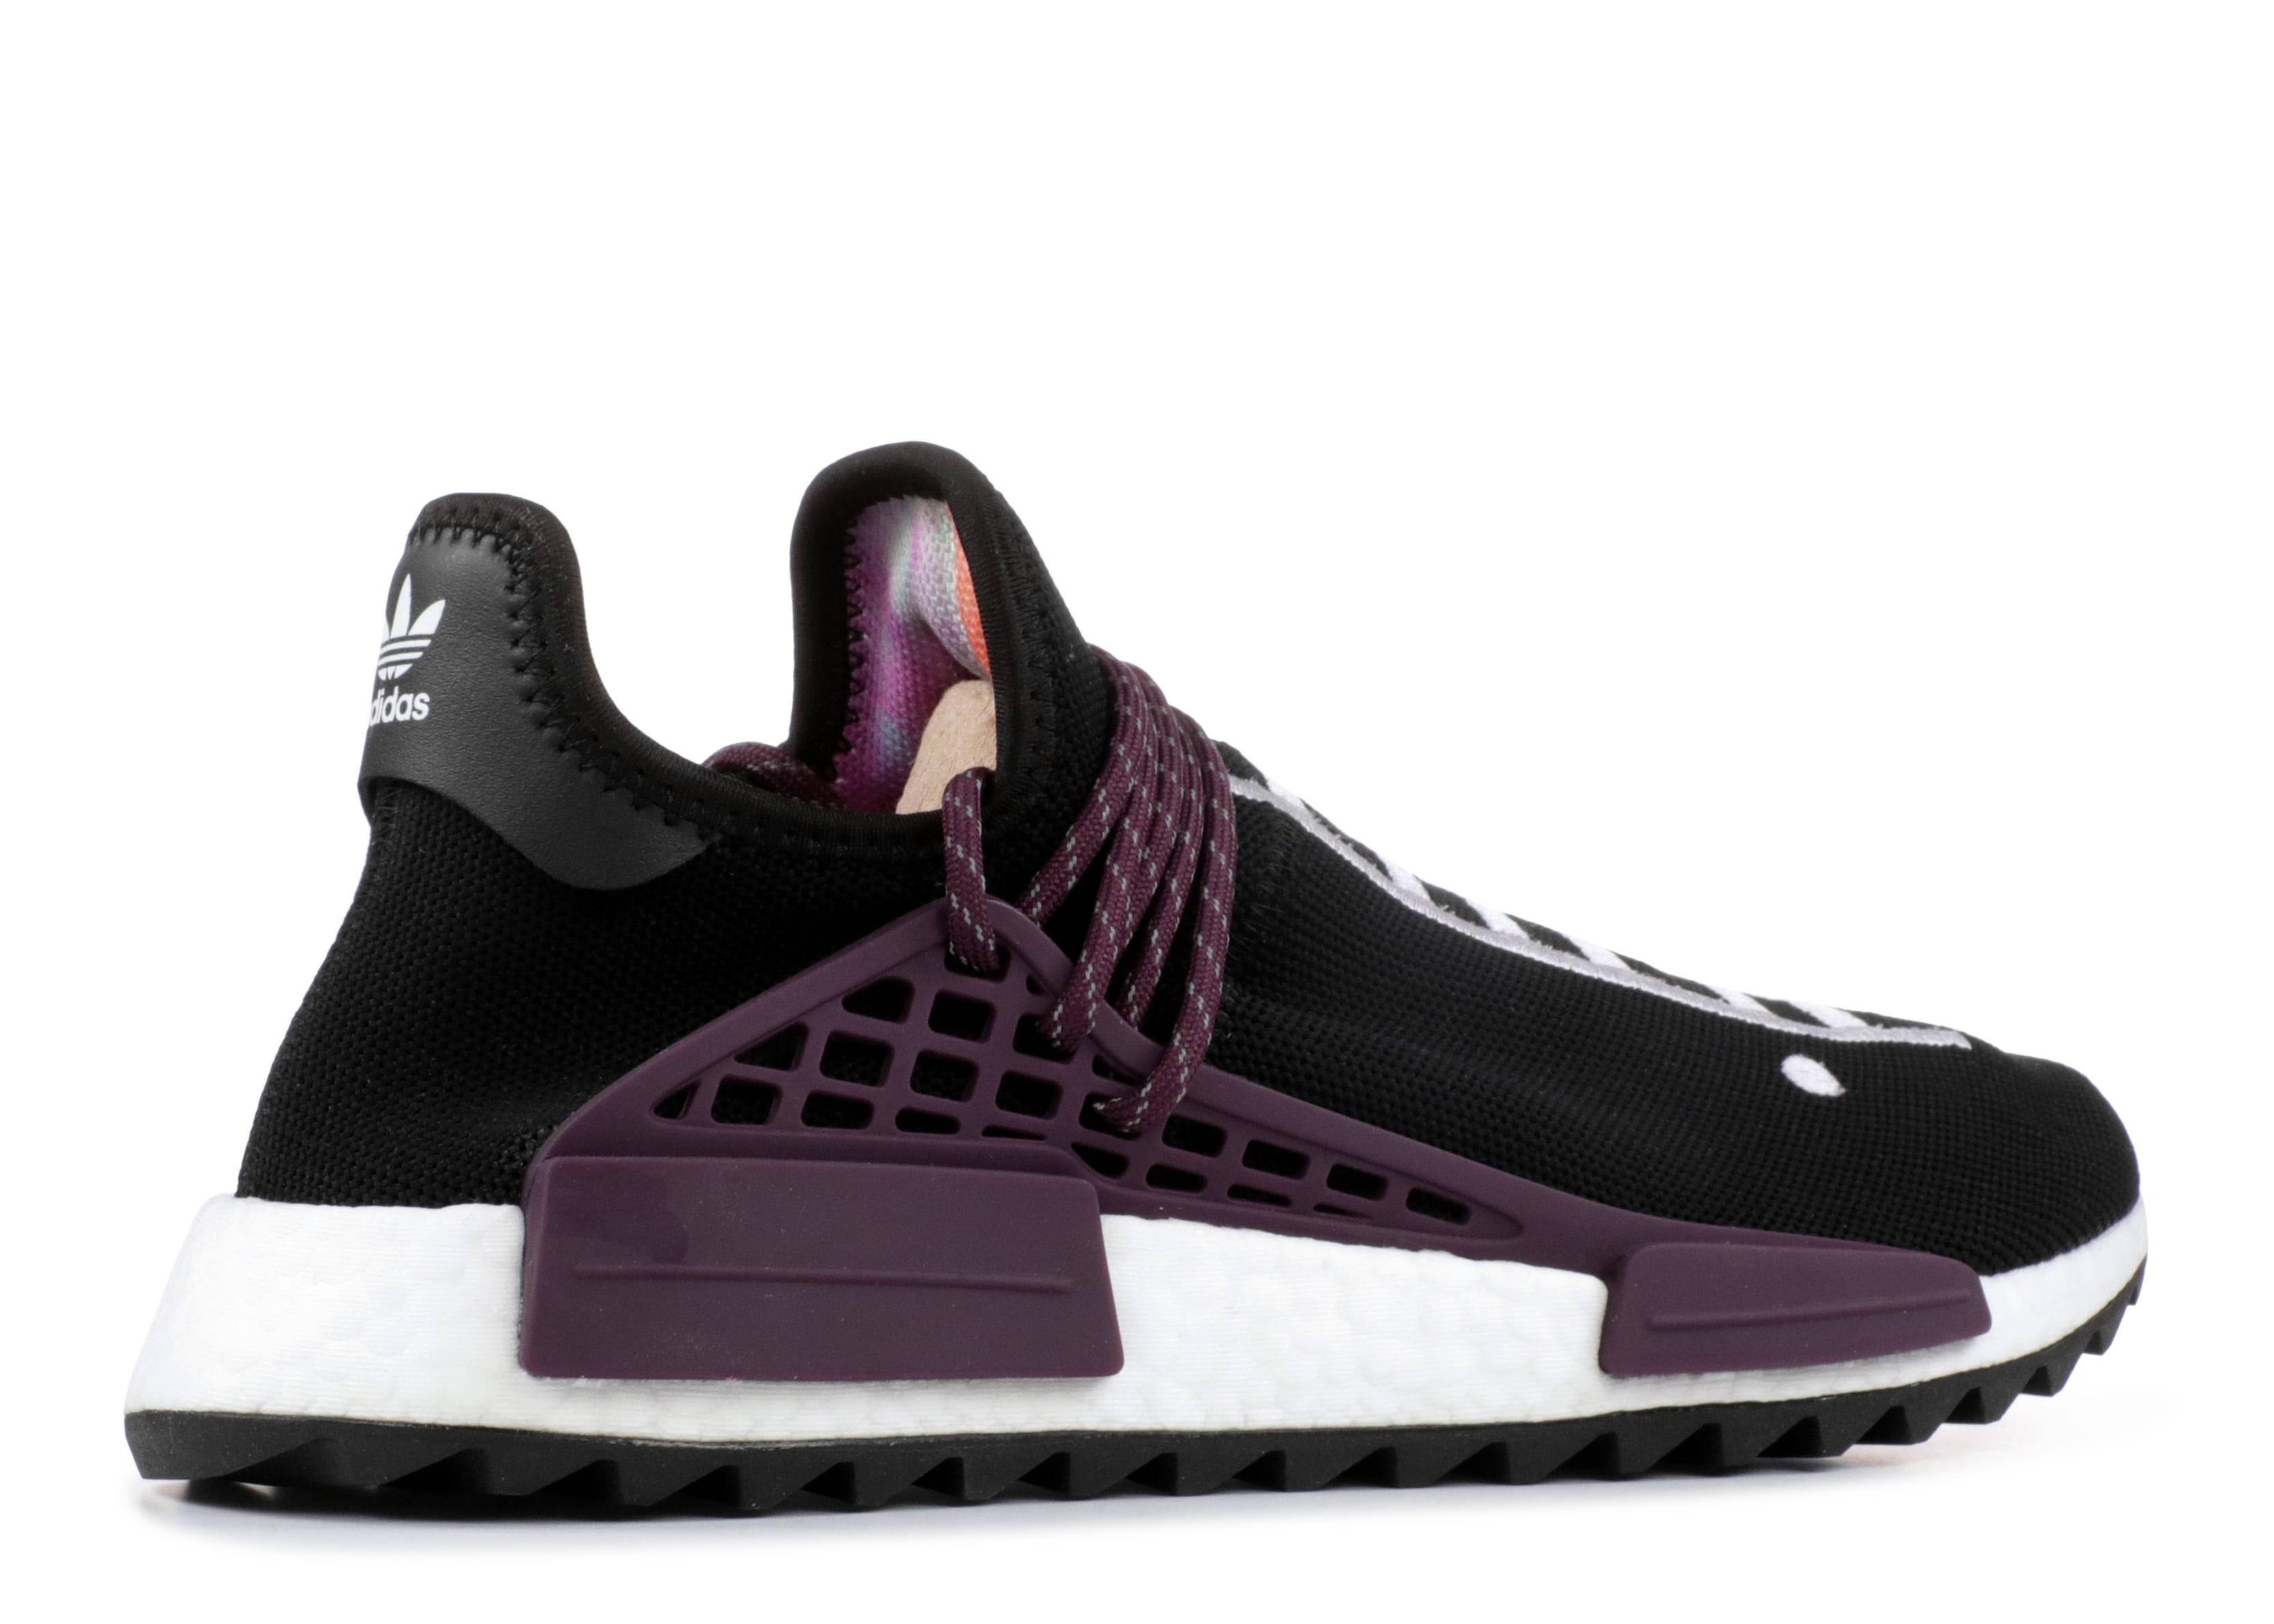 01ee6043f Adidas Human Race NMD Pharrell Holi Festival Core Black - 3